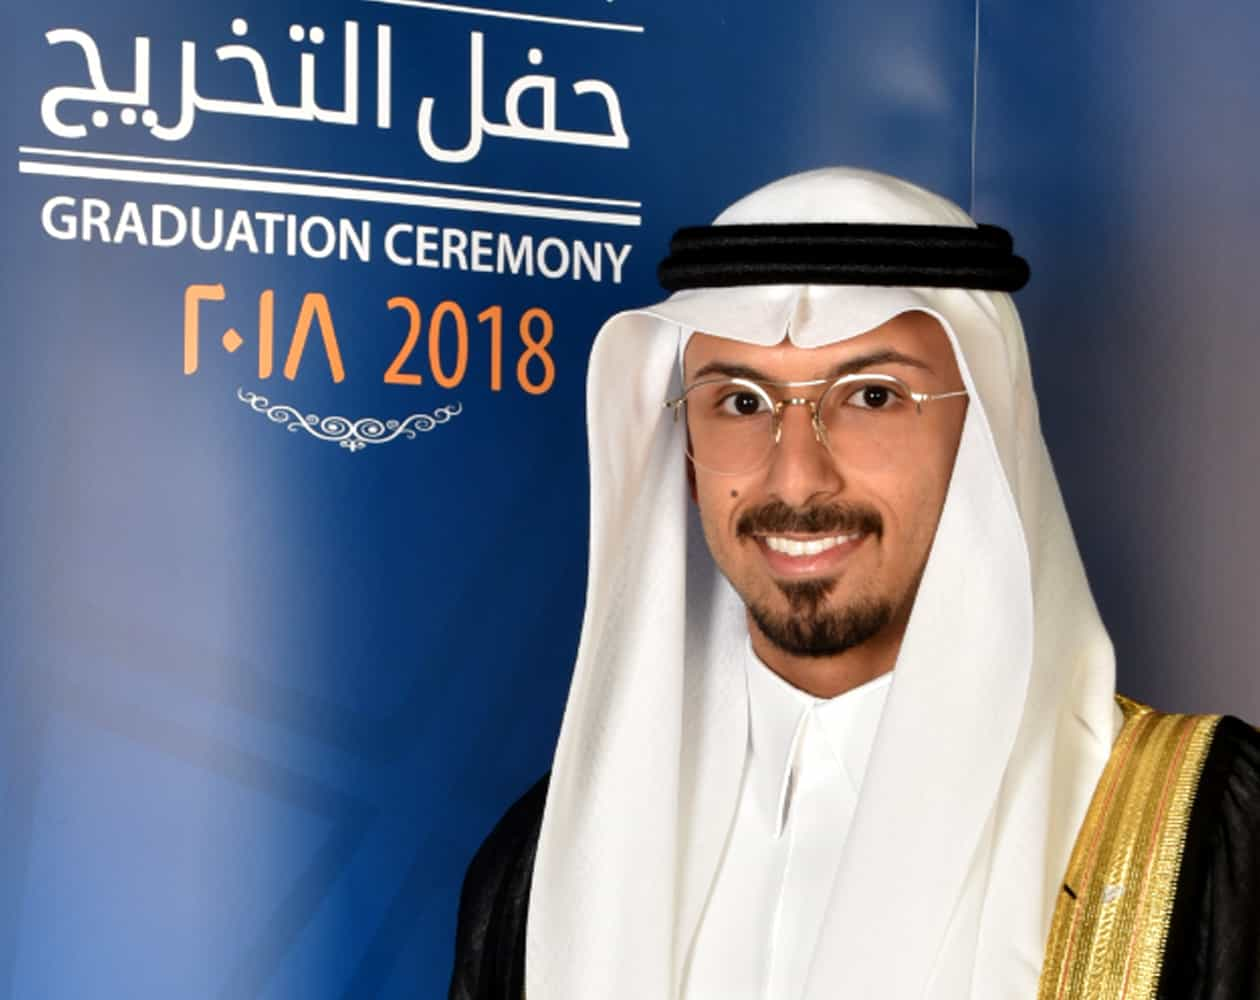 Mohamad Al-Mohisen